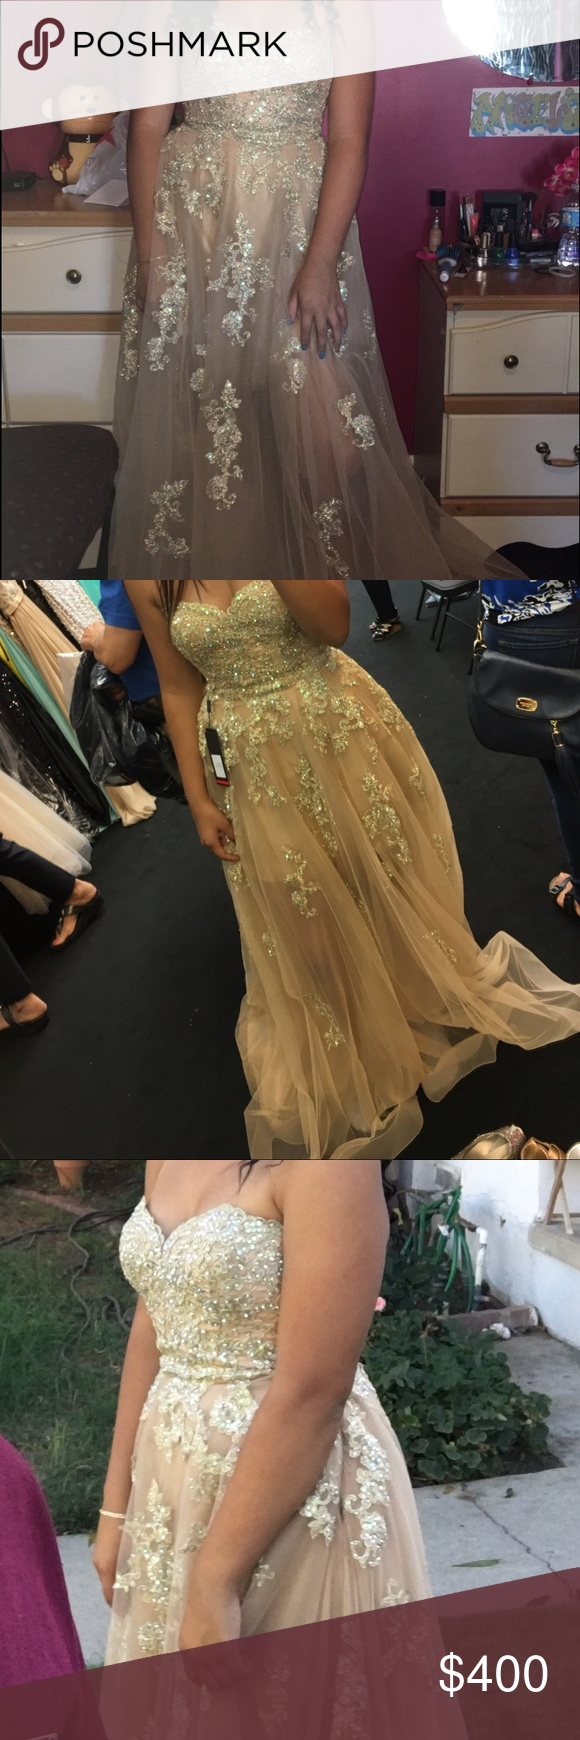 Gold prom dress gold prom dresses prom and dress prom